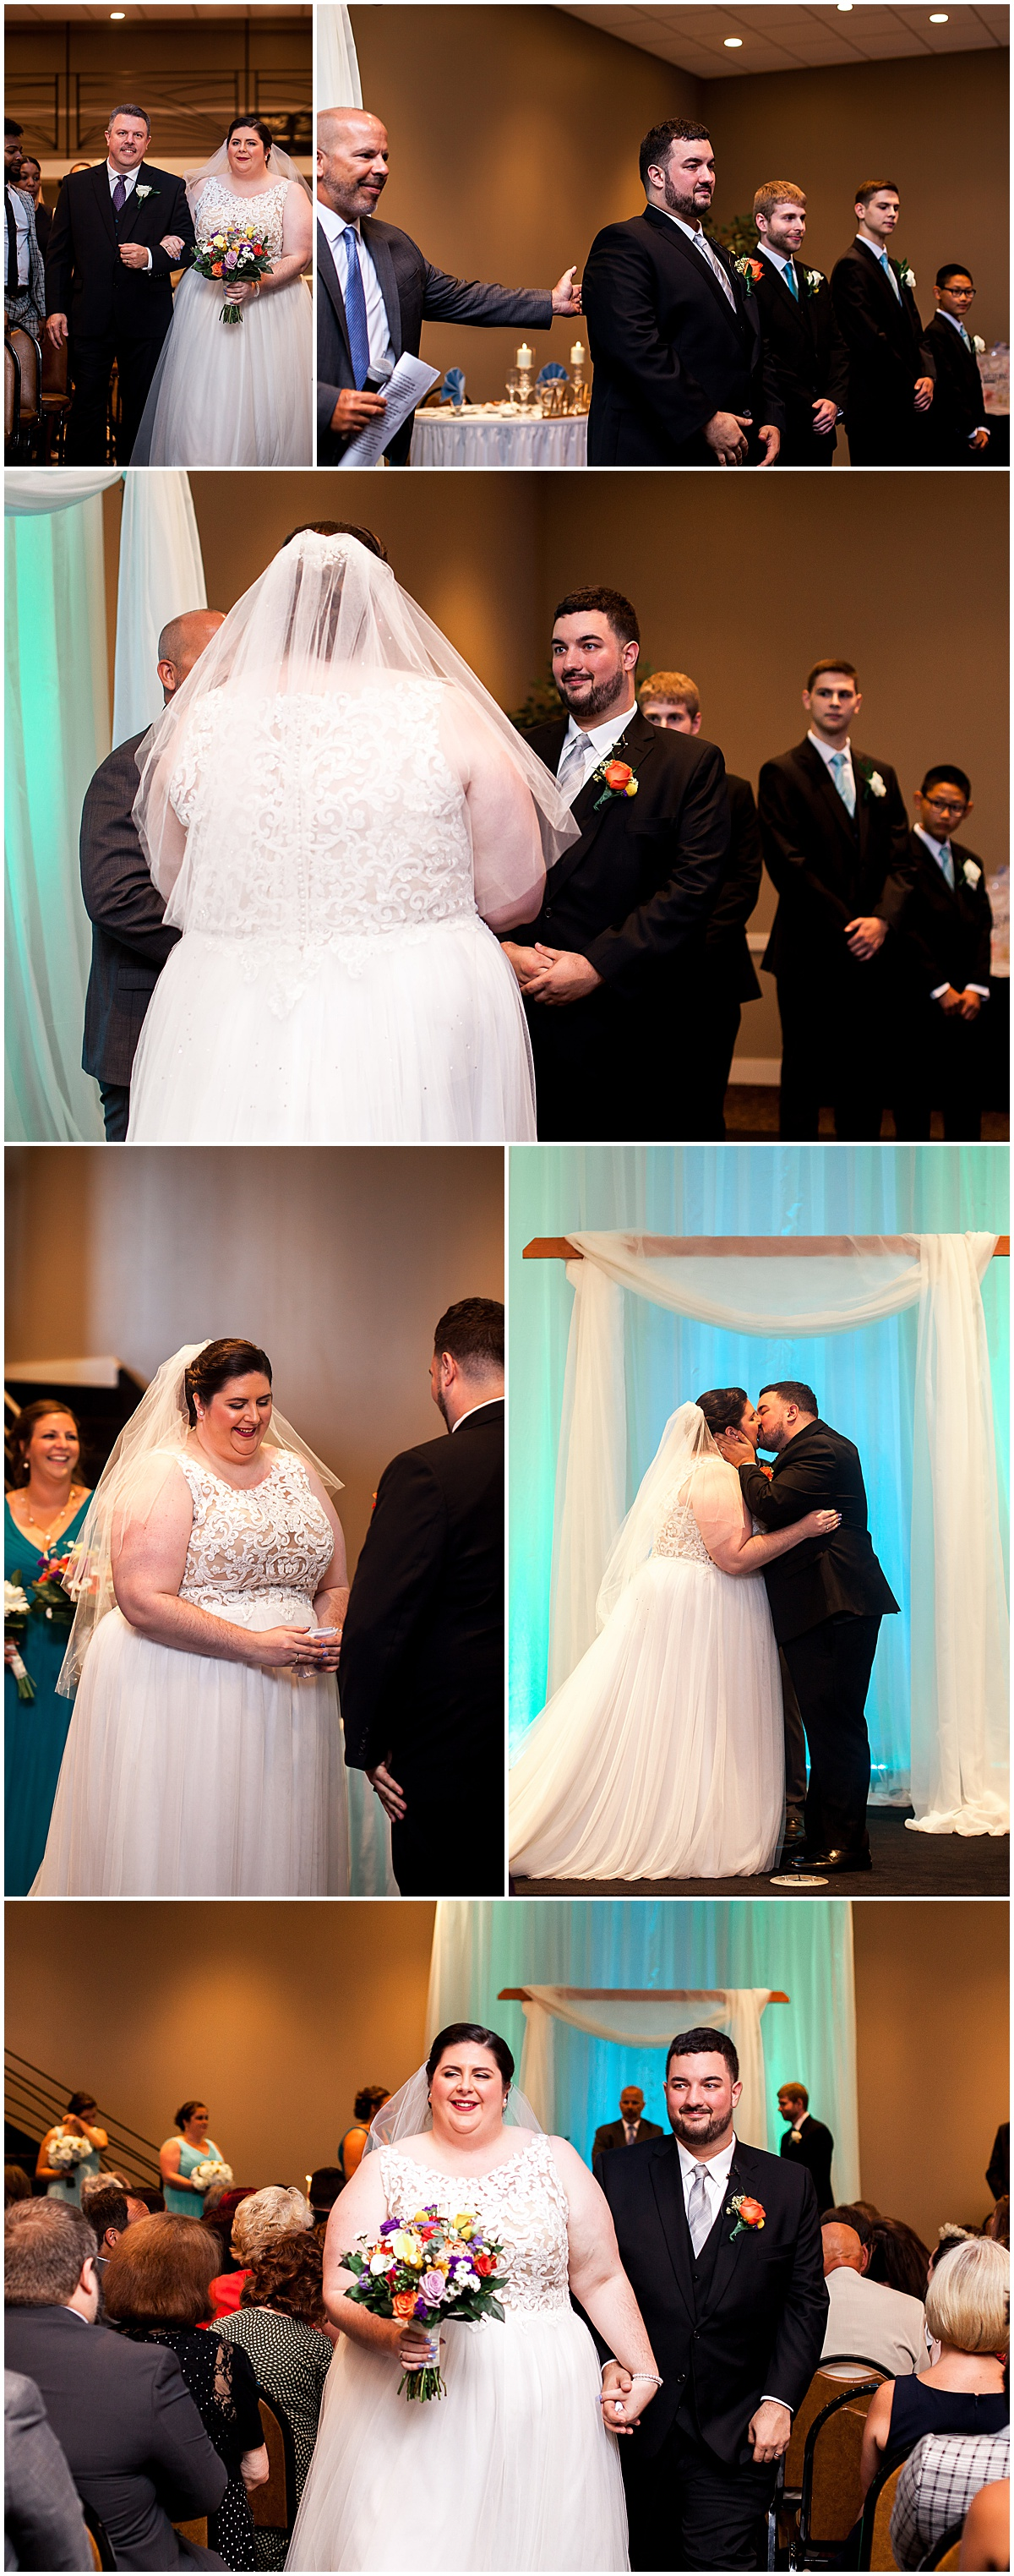 lexus and dan wedding ceremony at the fez liz capuano photography